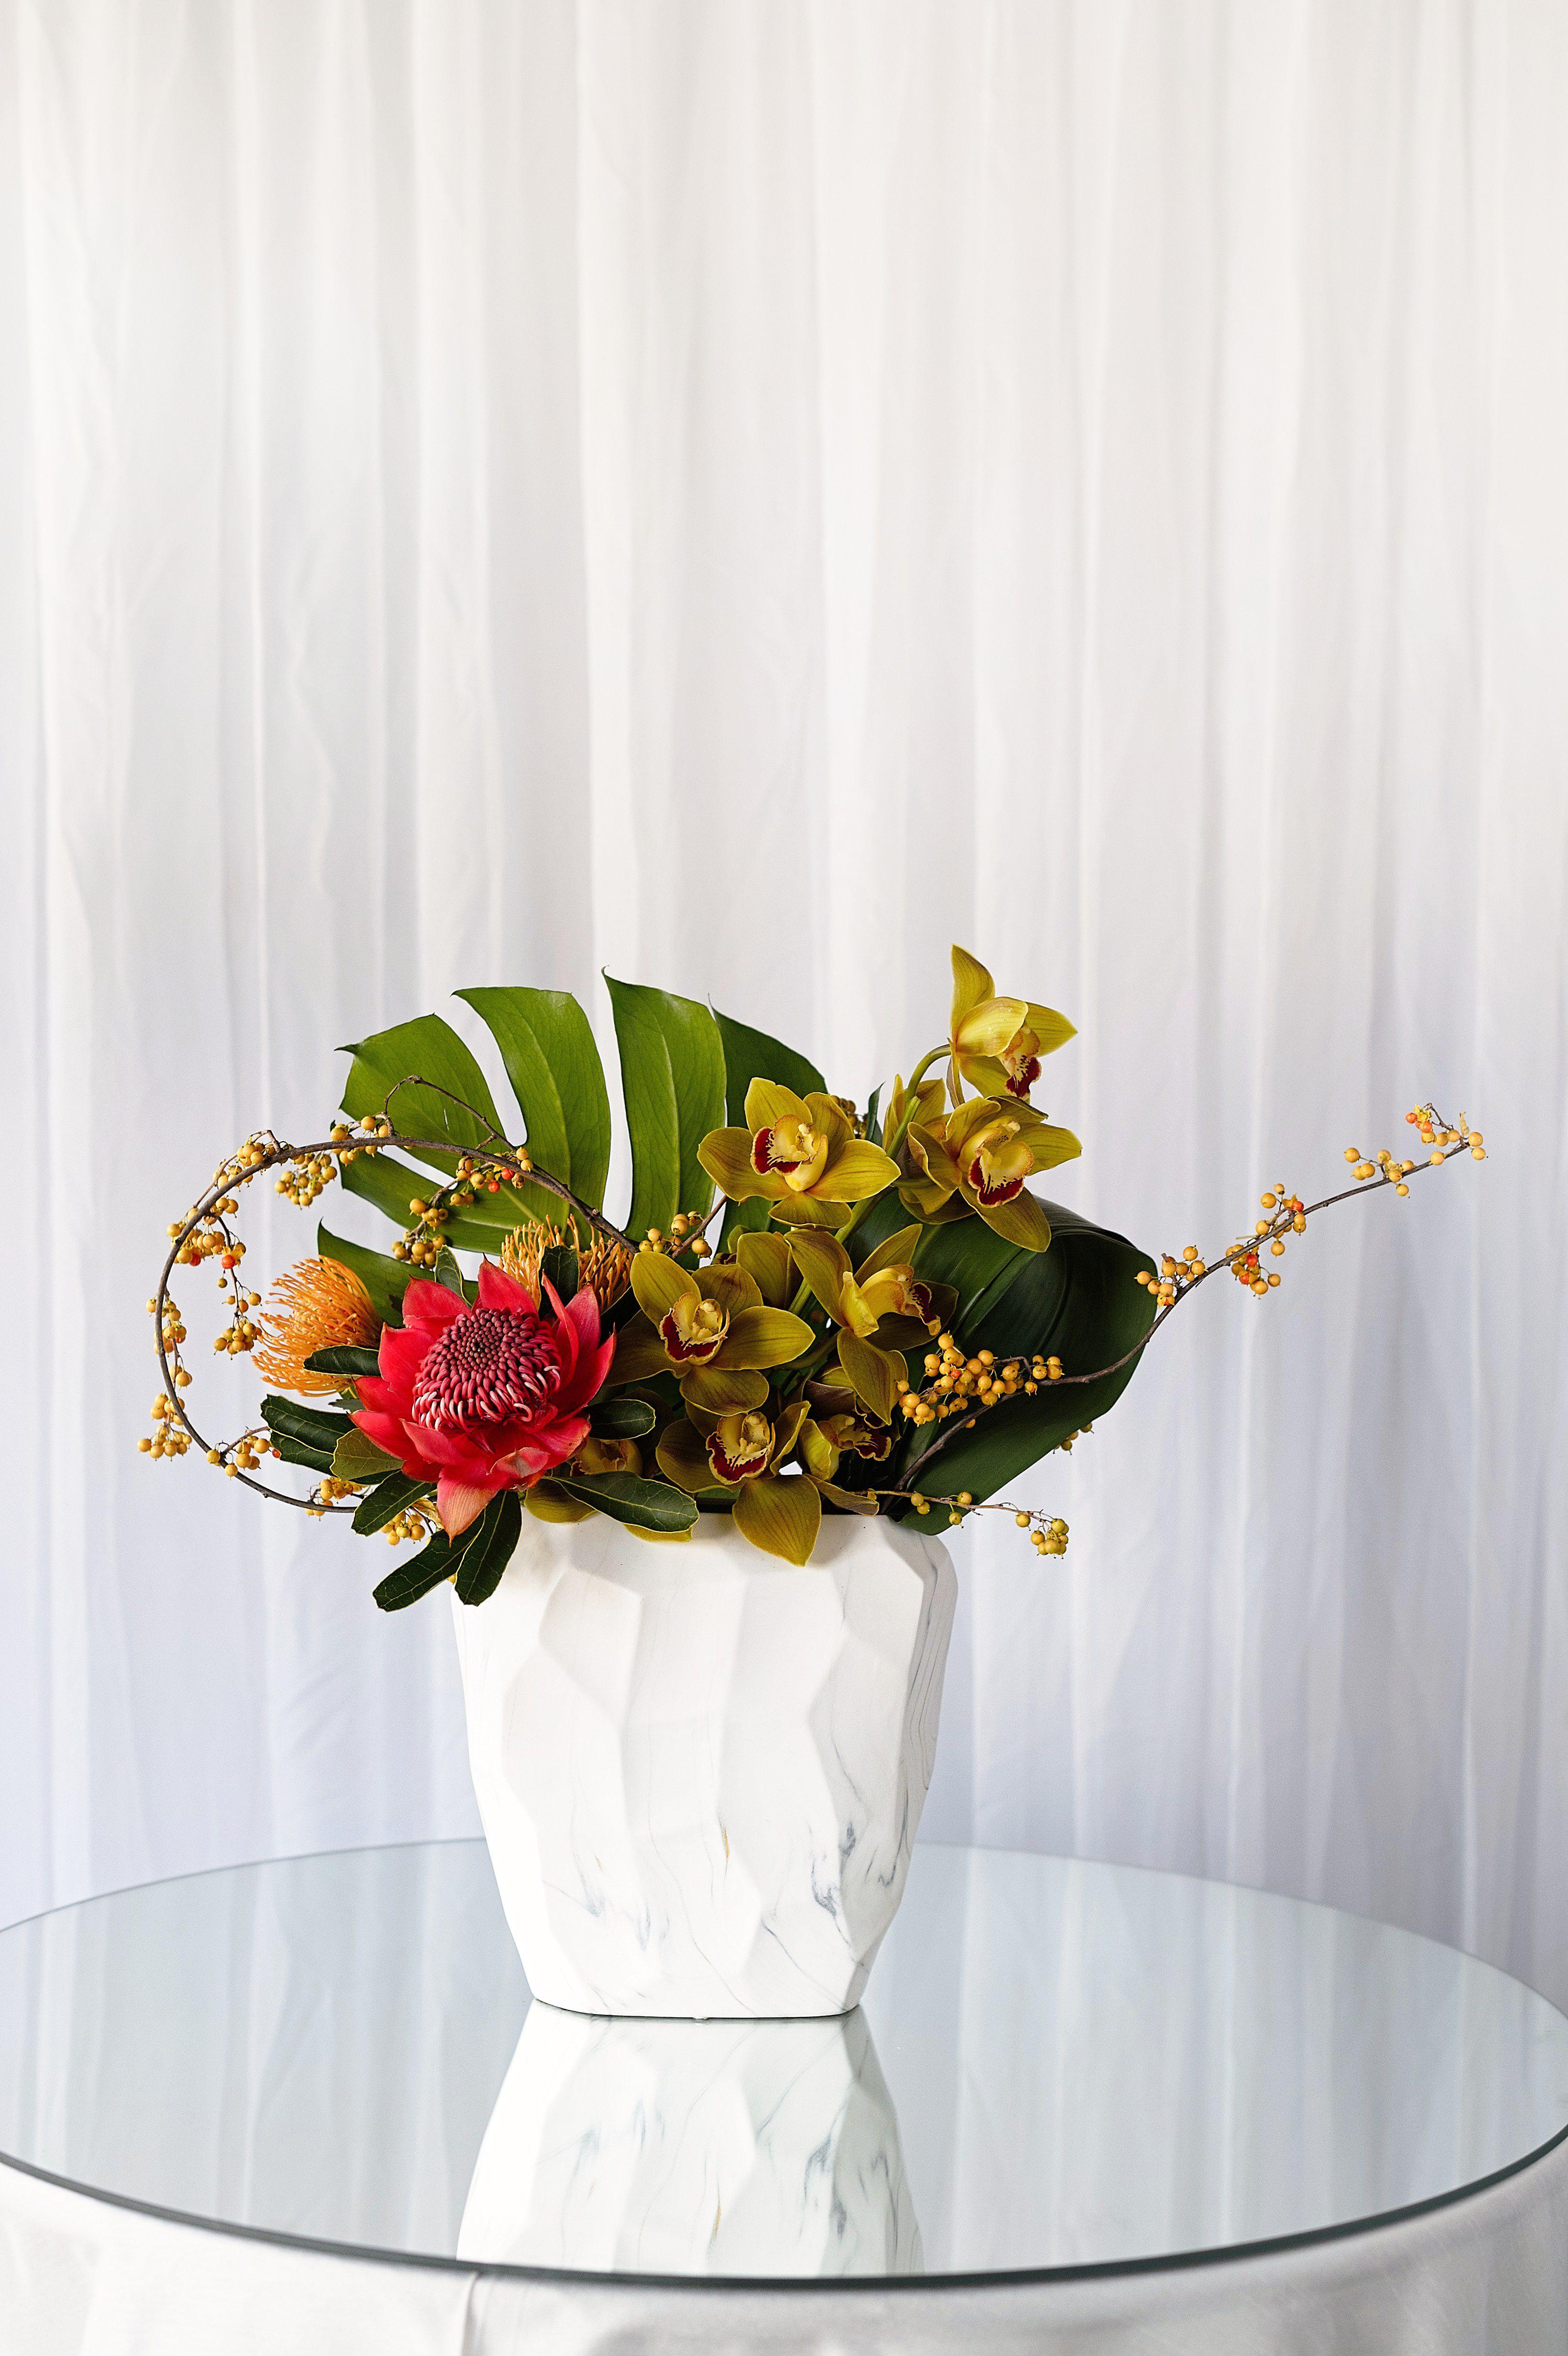 Pure Autumn Arrangement Modern Cymbidium Orchids And Protea